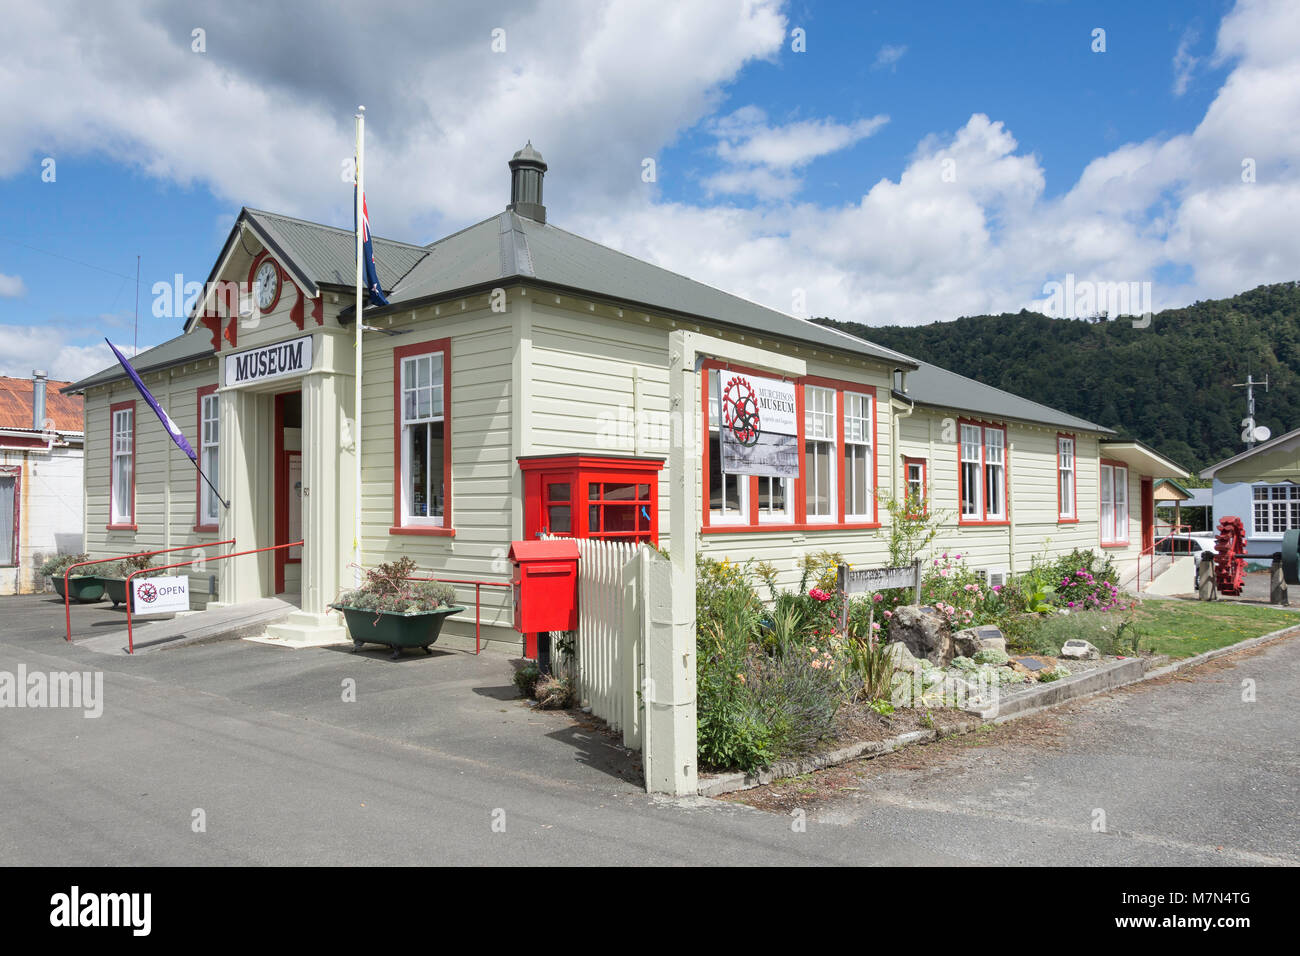 Murchison Historical & Museum Society, Fairfax Street, Murchison, Tasman Region, New Zealand - Stock Image